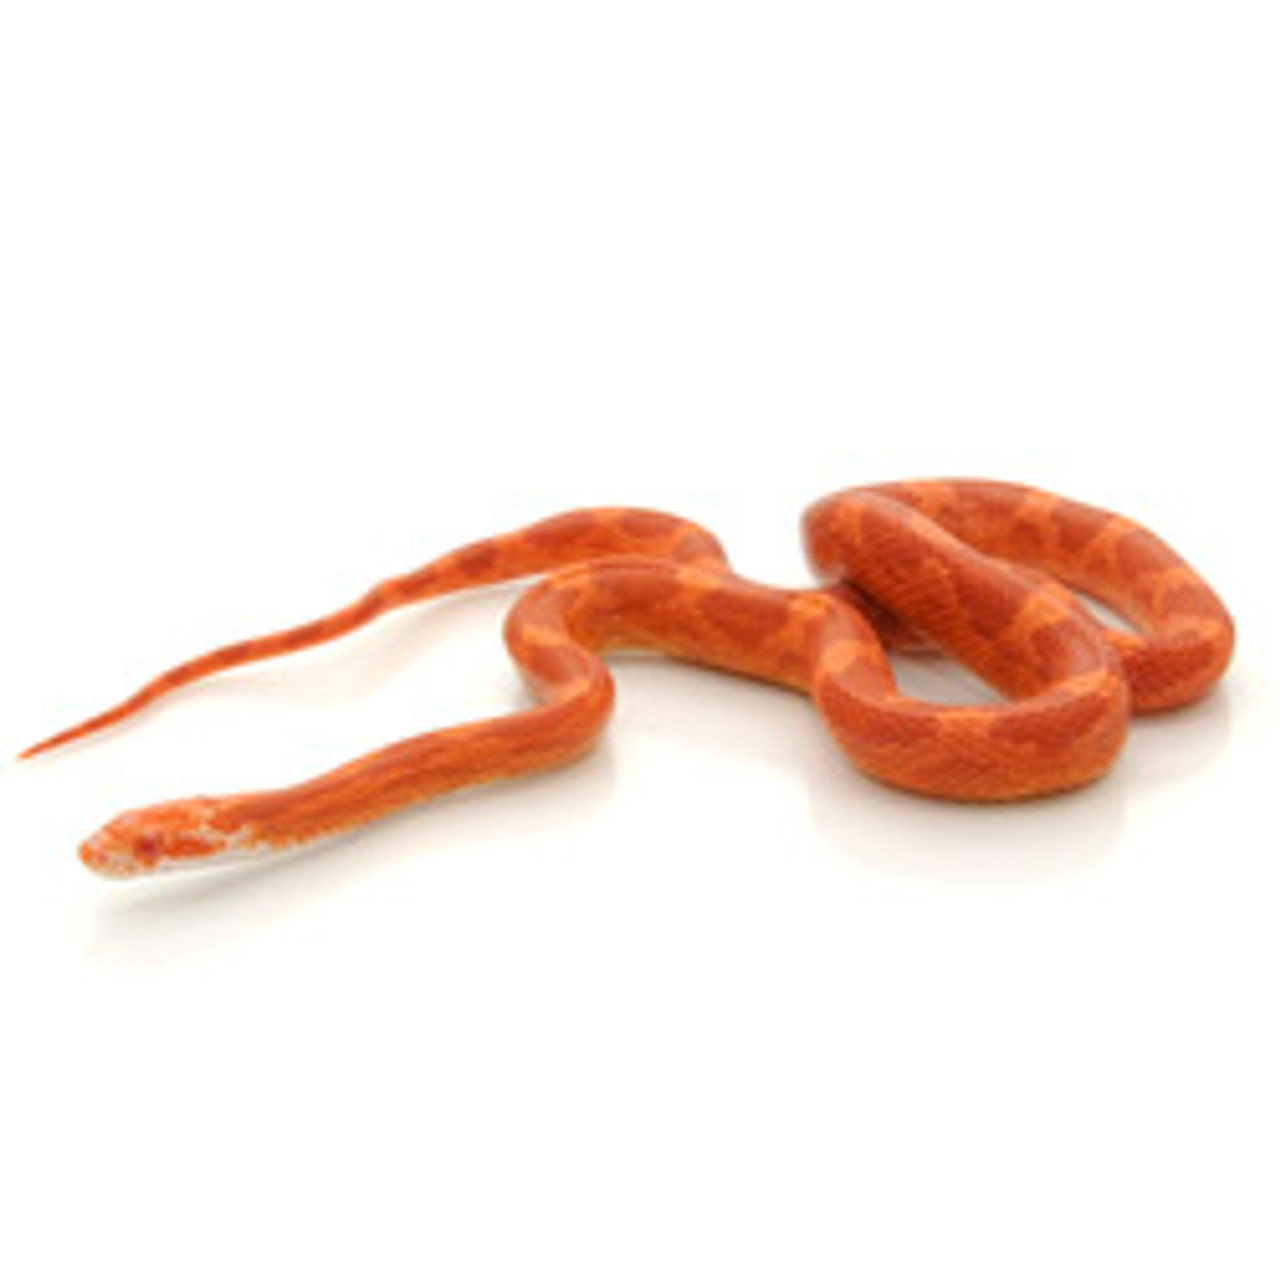 Albino Bloodred Corn Snake (Pantherophis guttata)